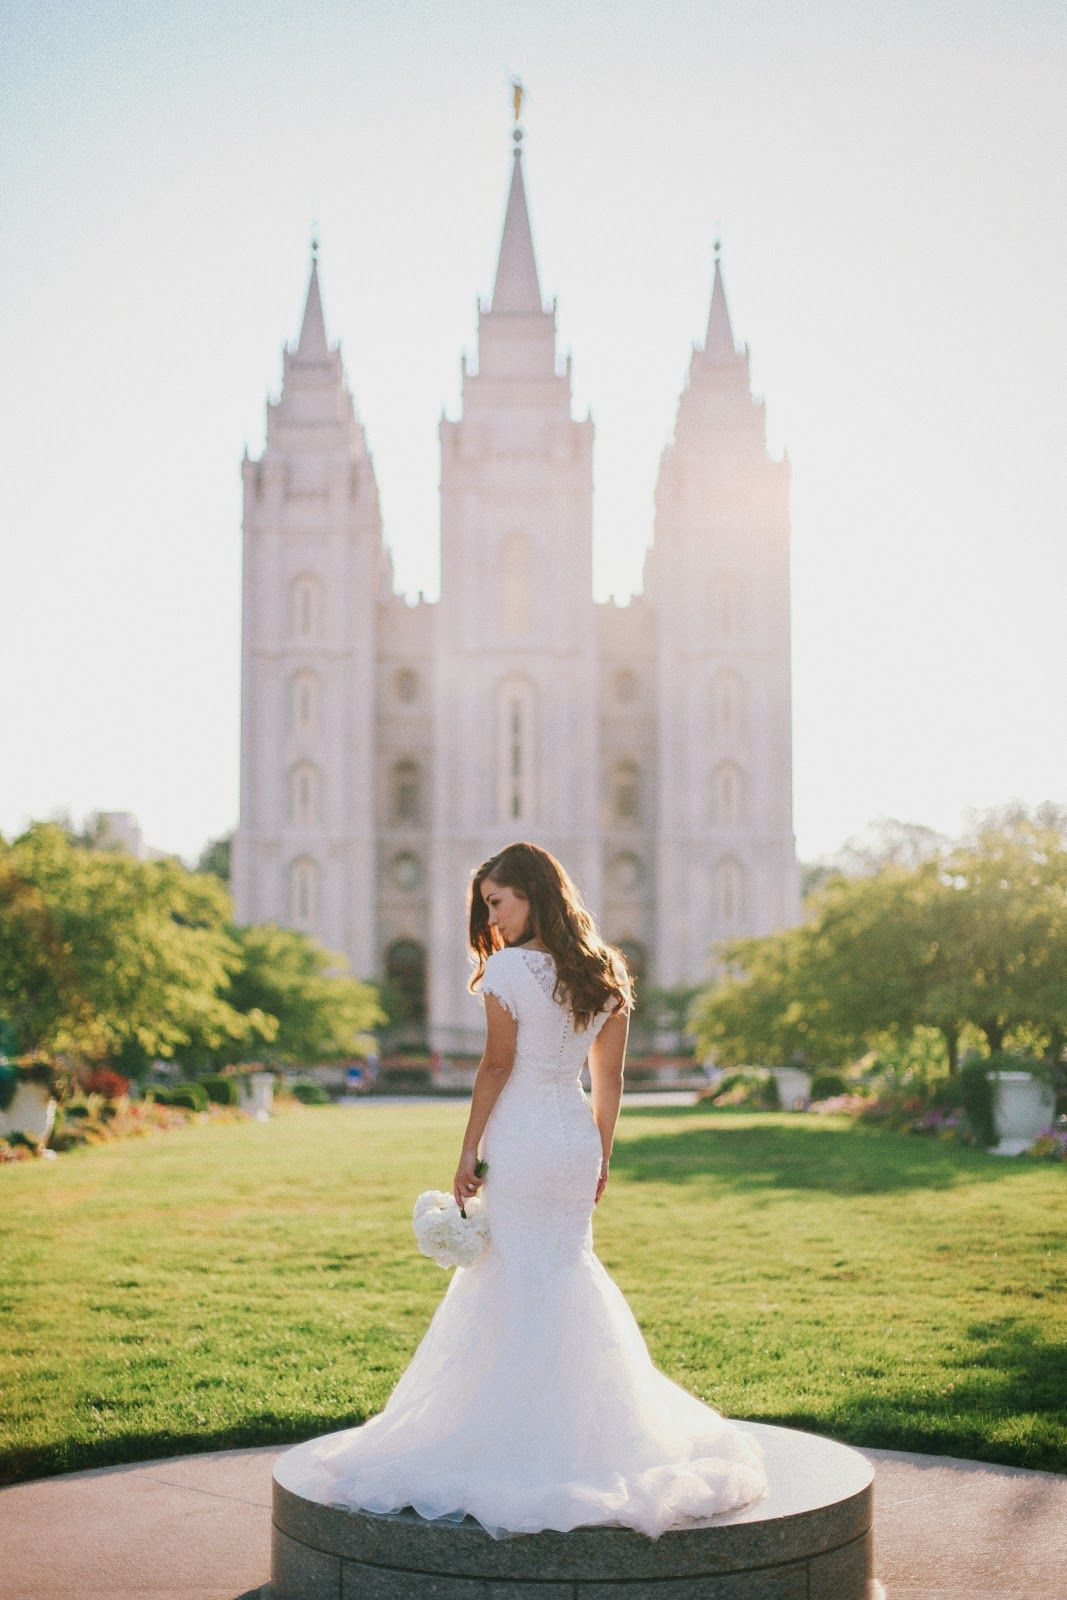 LDS Wedding Couple Photography   Eternity.   Pinterest ...